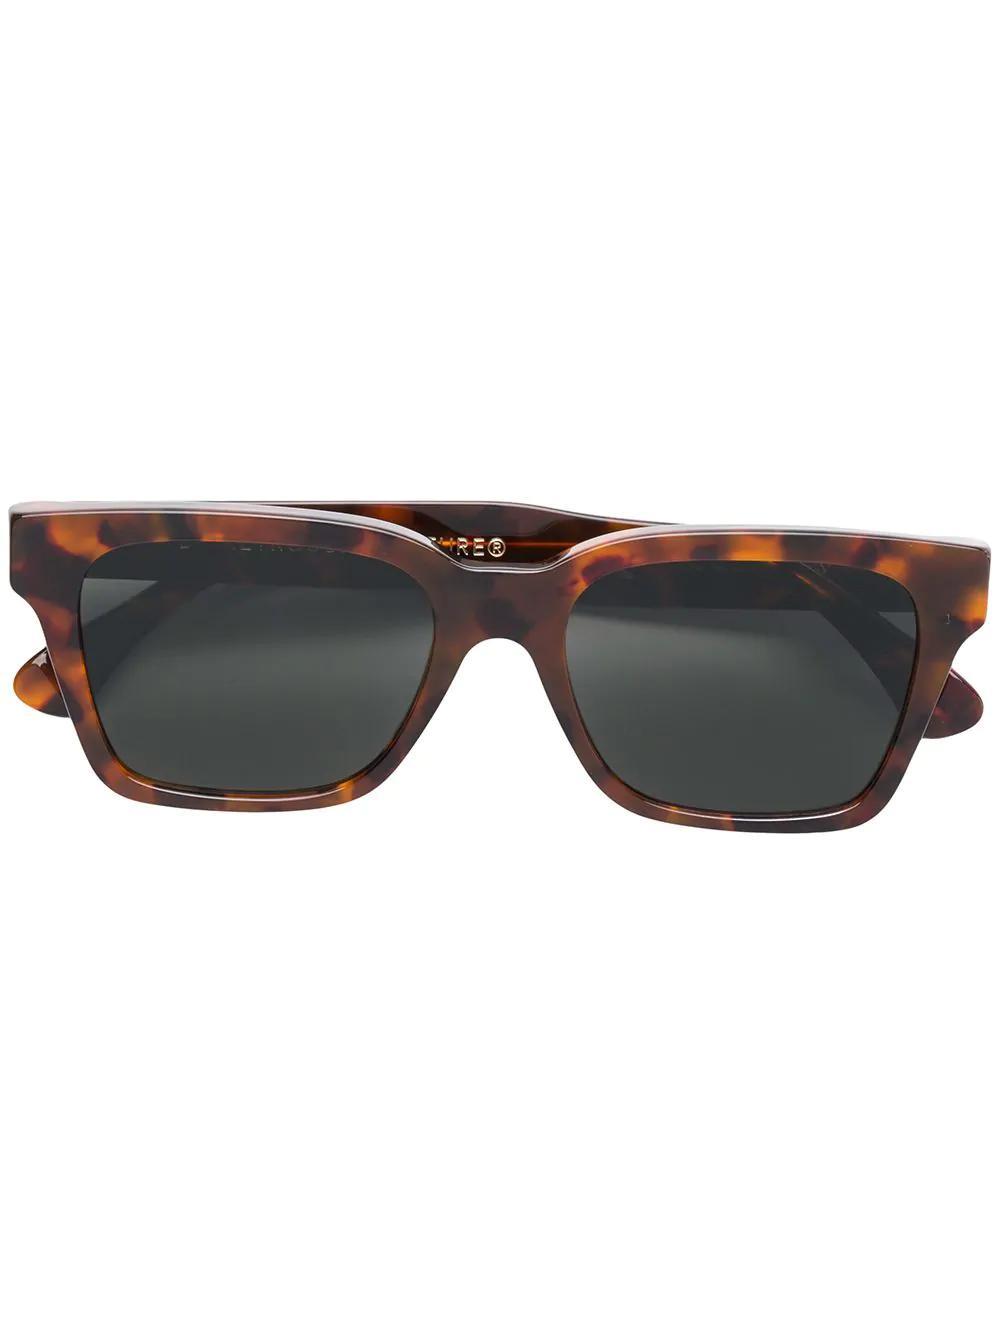 27c9bcd70ddf Retrosuperfuture America Sunglasses - Brown | ModeSens